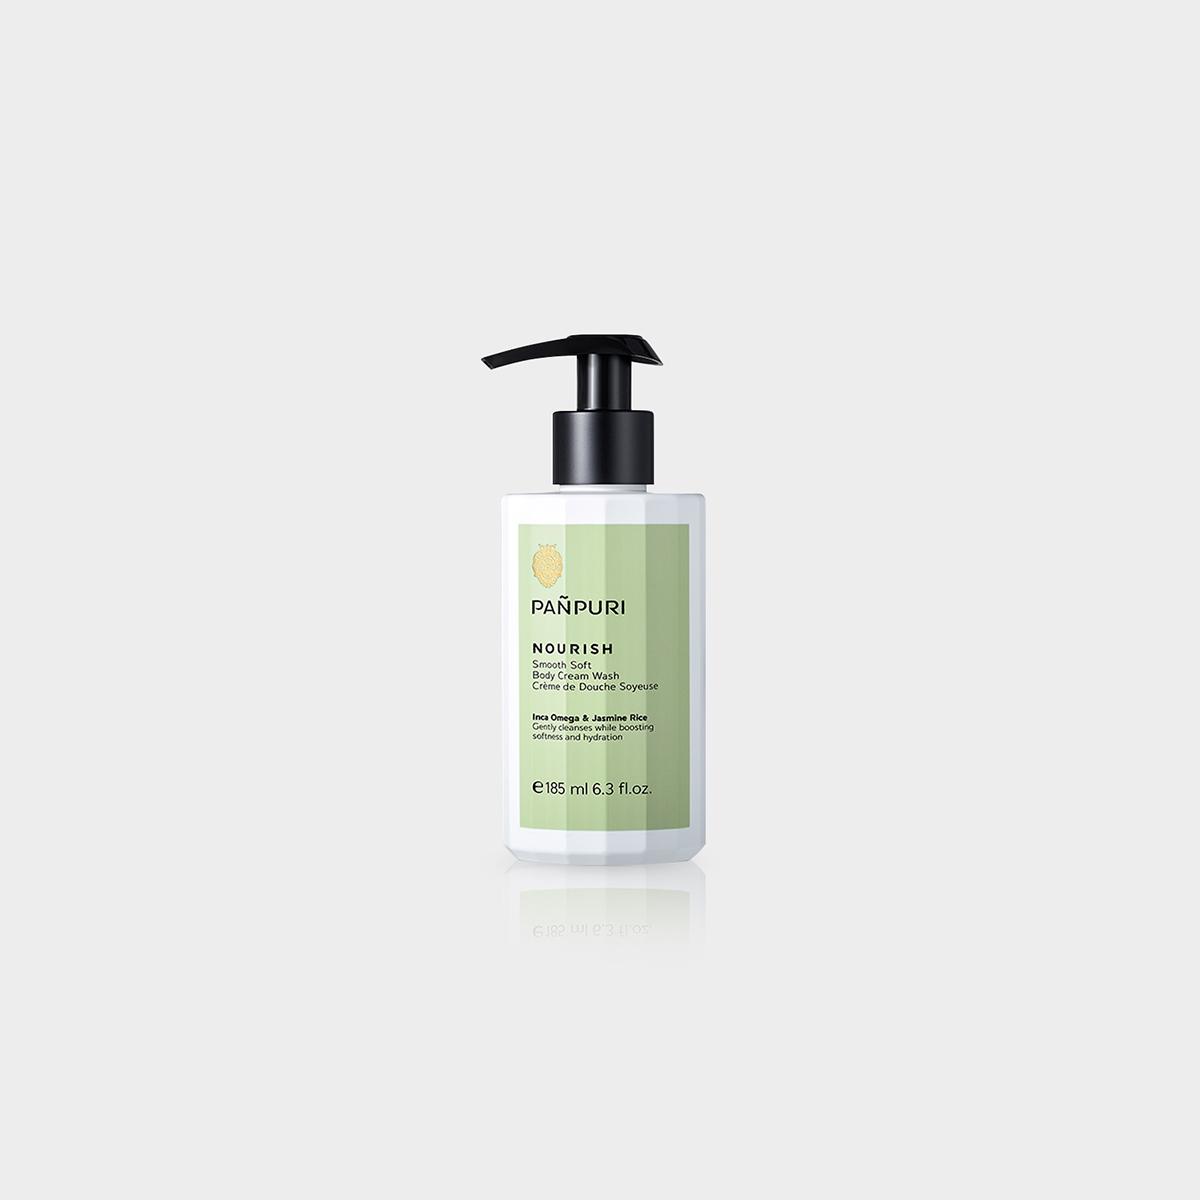 Papuri Nourish Smooth Soft Body Cream Wash